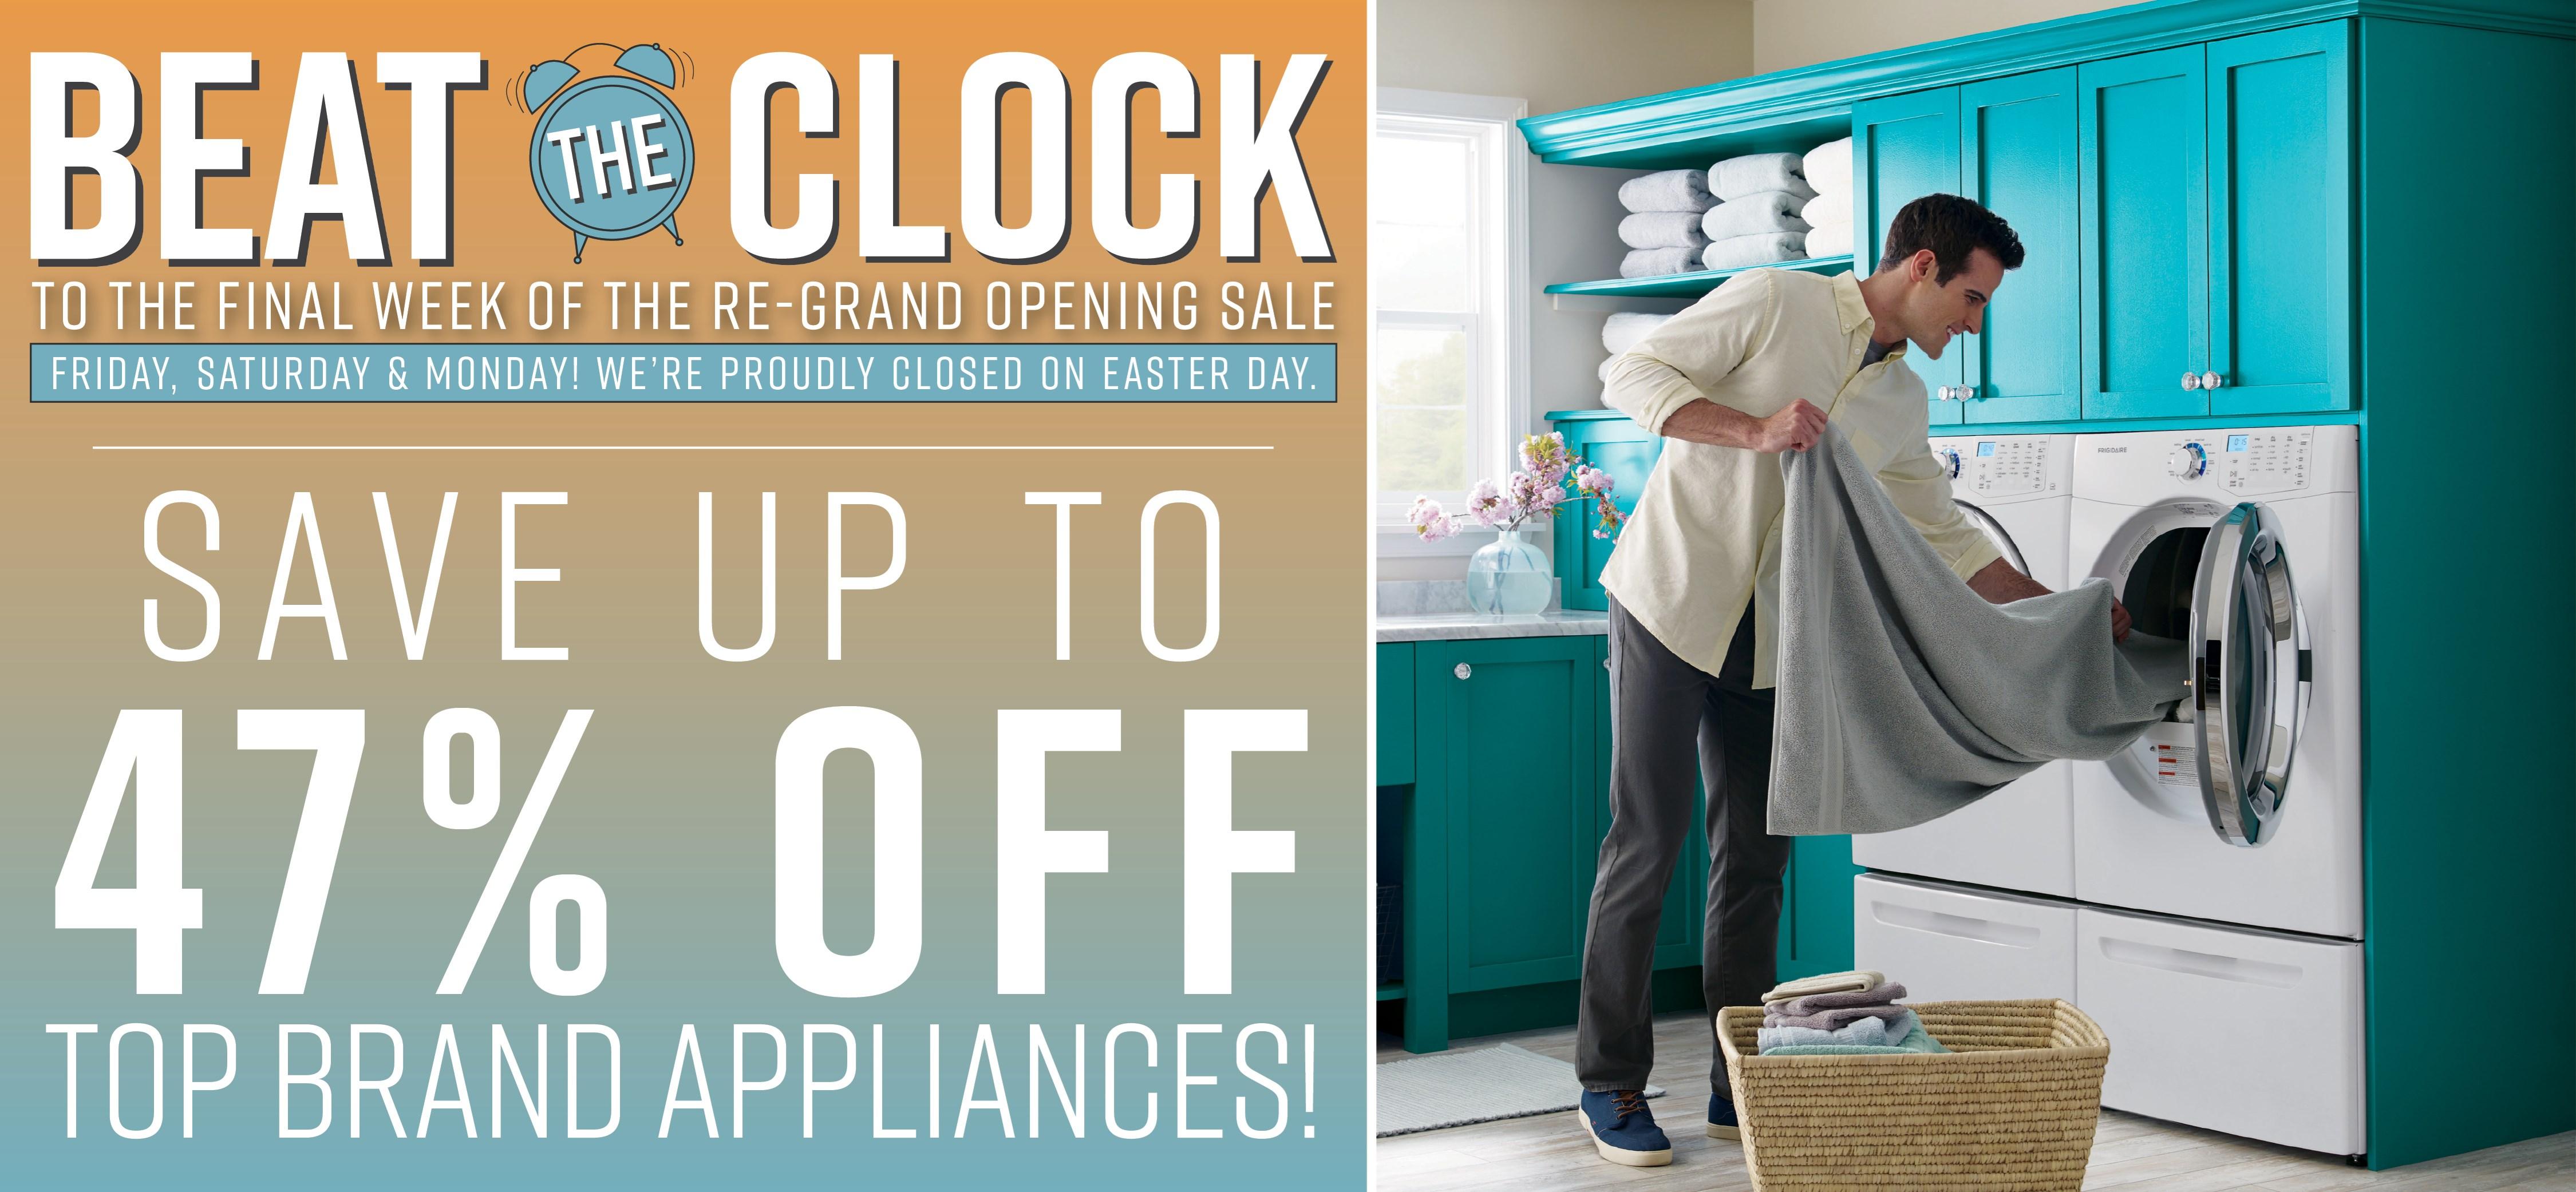 Furniture & ApplianceMart Beat the Clock Easter Weekend